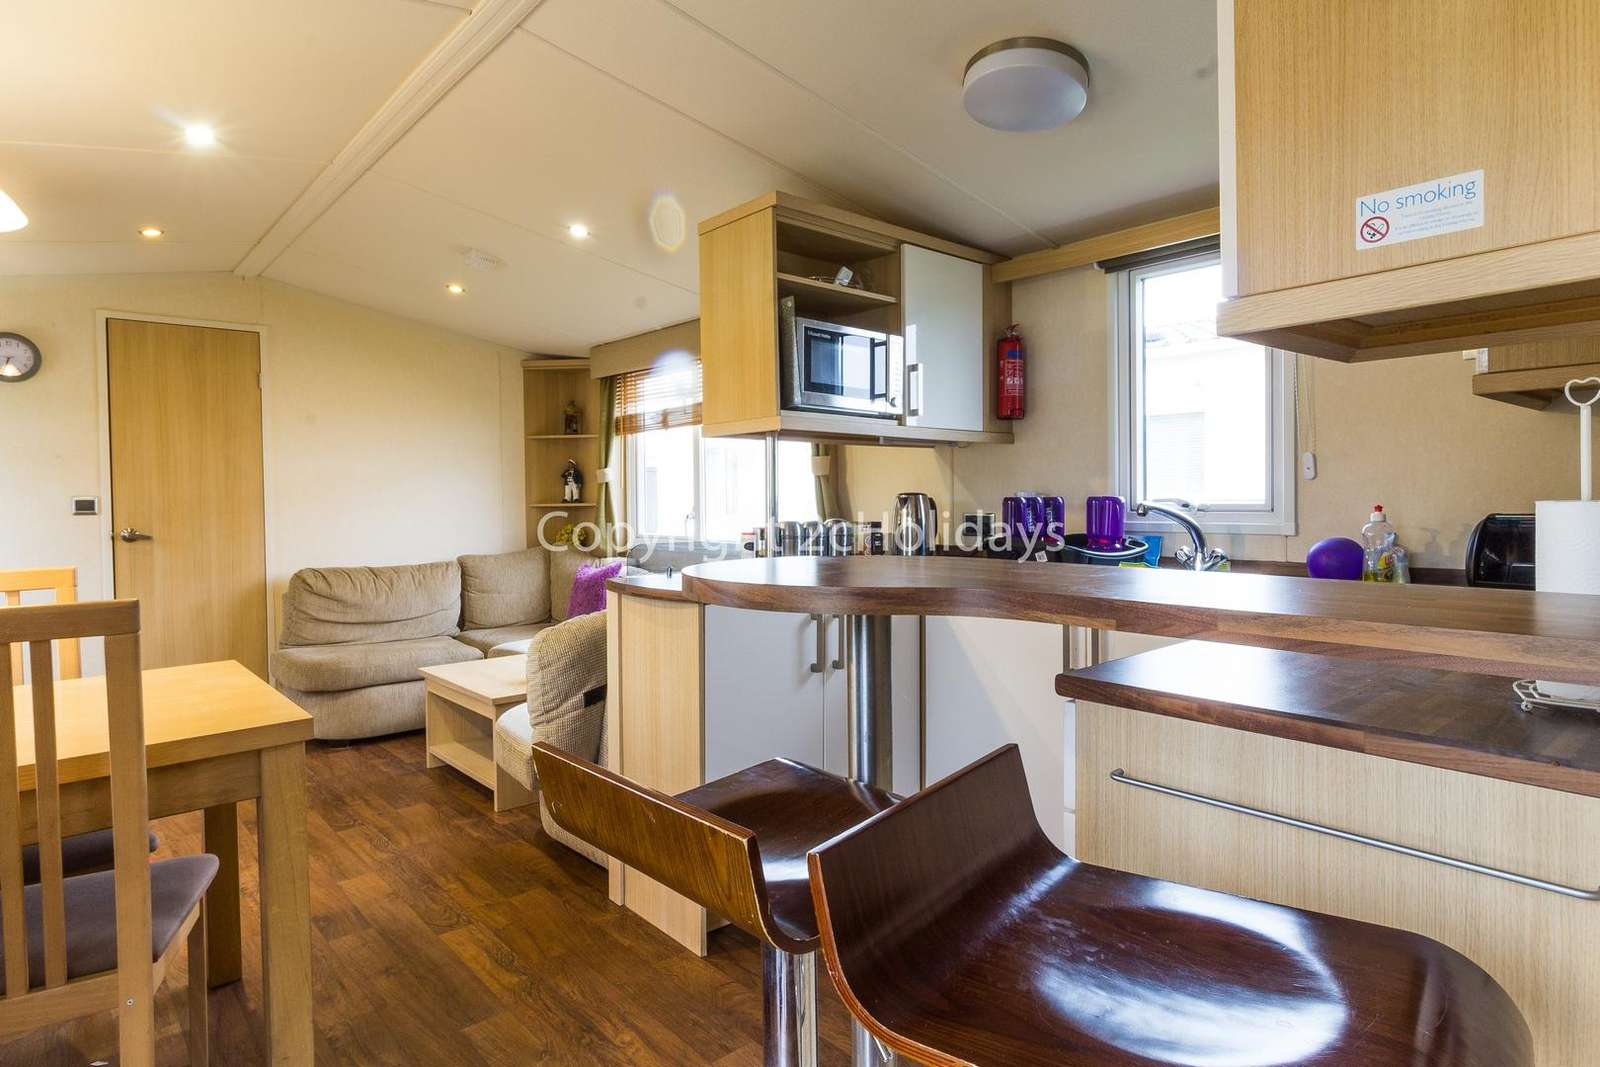 Mini breakfast bar in this caravan!